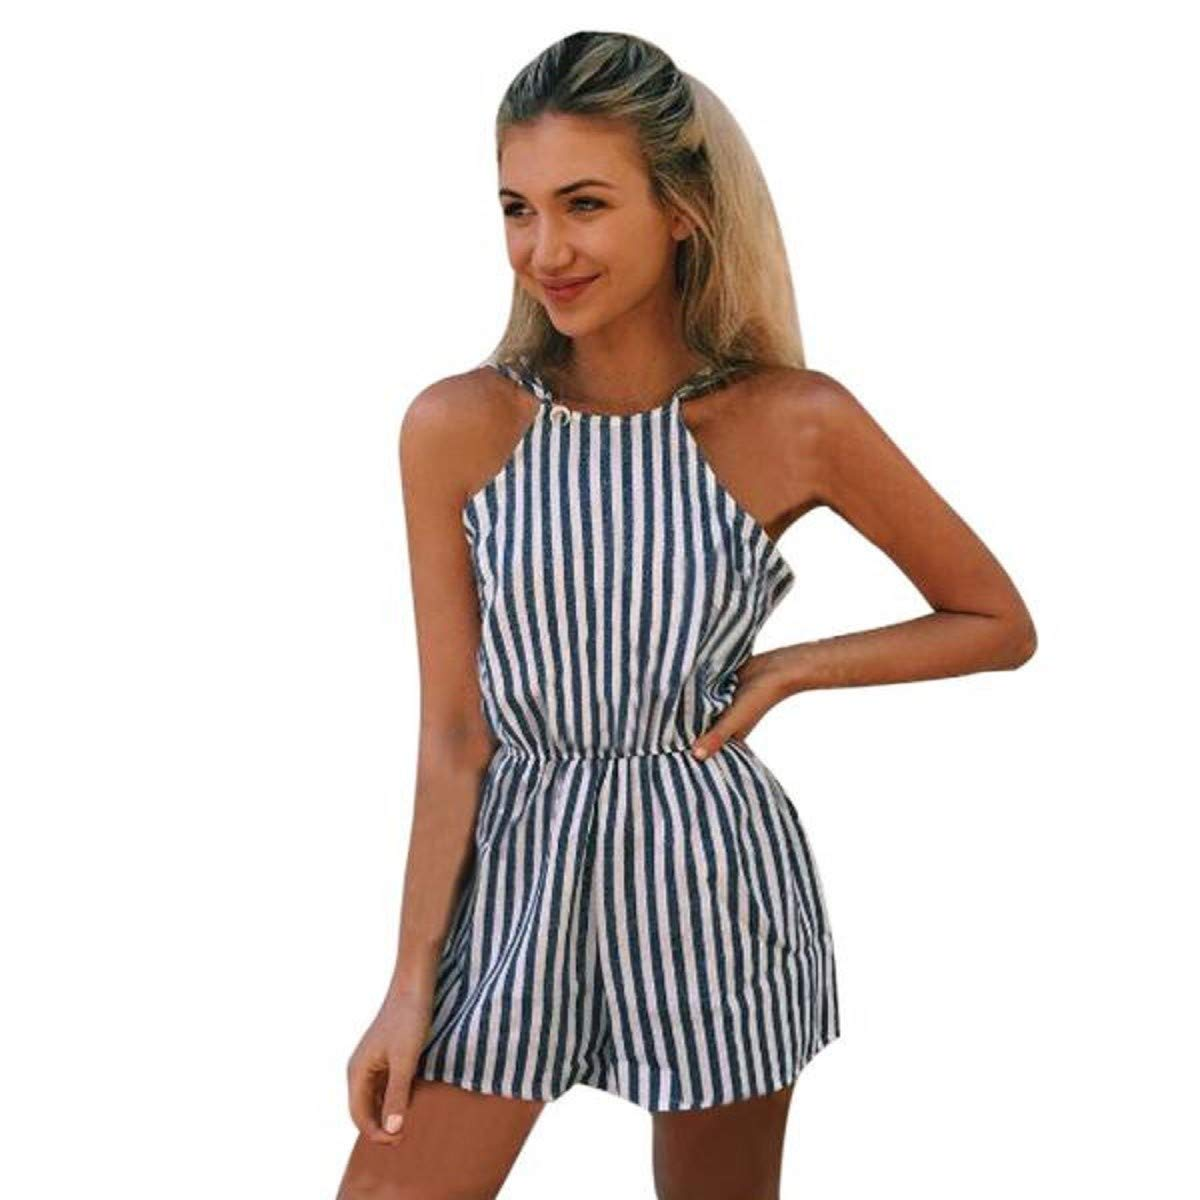 OTINICE Women Sexy Mini Playsuit Summer Stripe Shorts Romper Jumpsuit Beach Sun Dress Navy